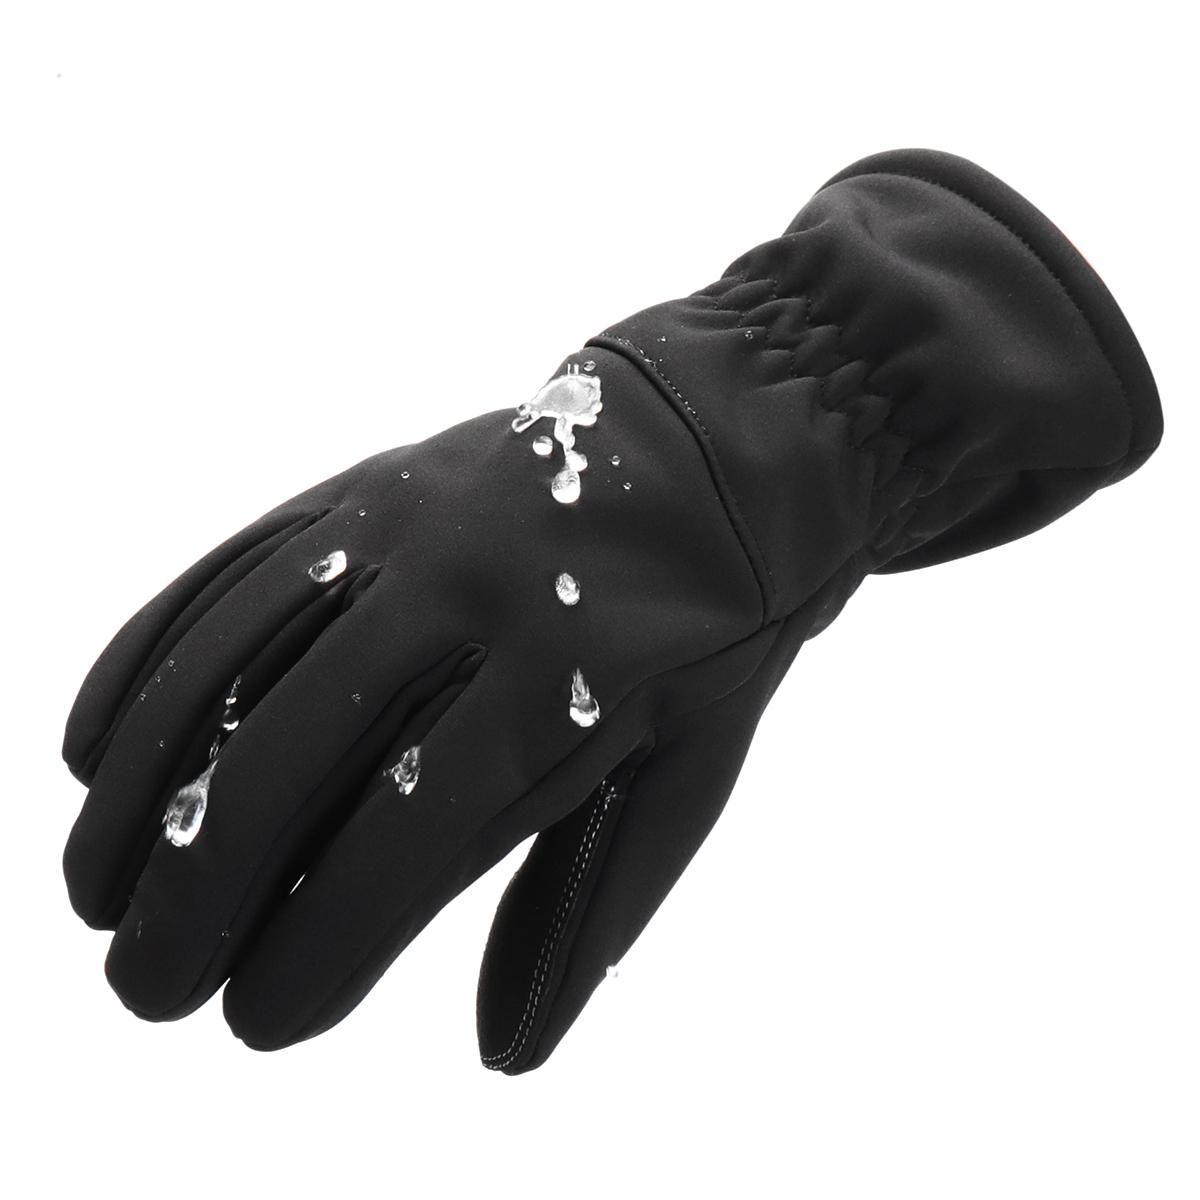 -30 Waterproof Motorcycle Ski Snowboard Gloves Warm Thermal Winter Sports Men Women